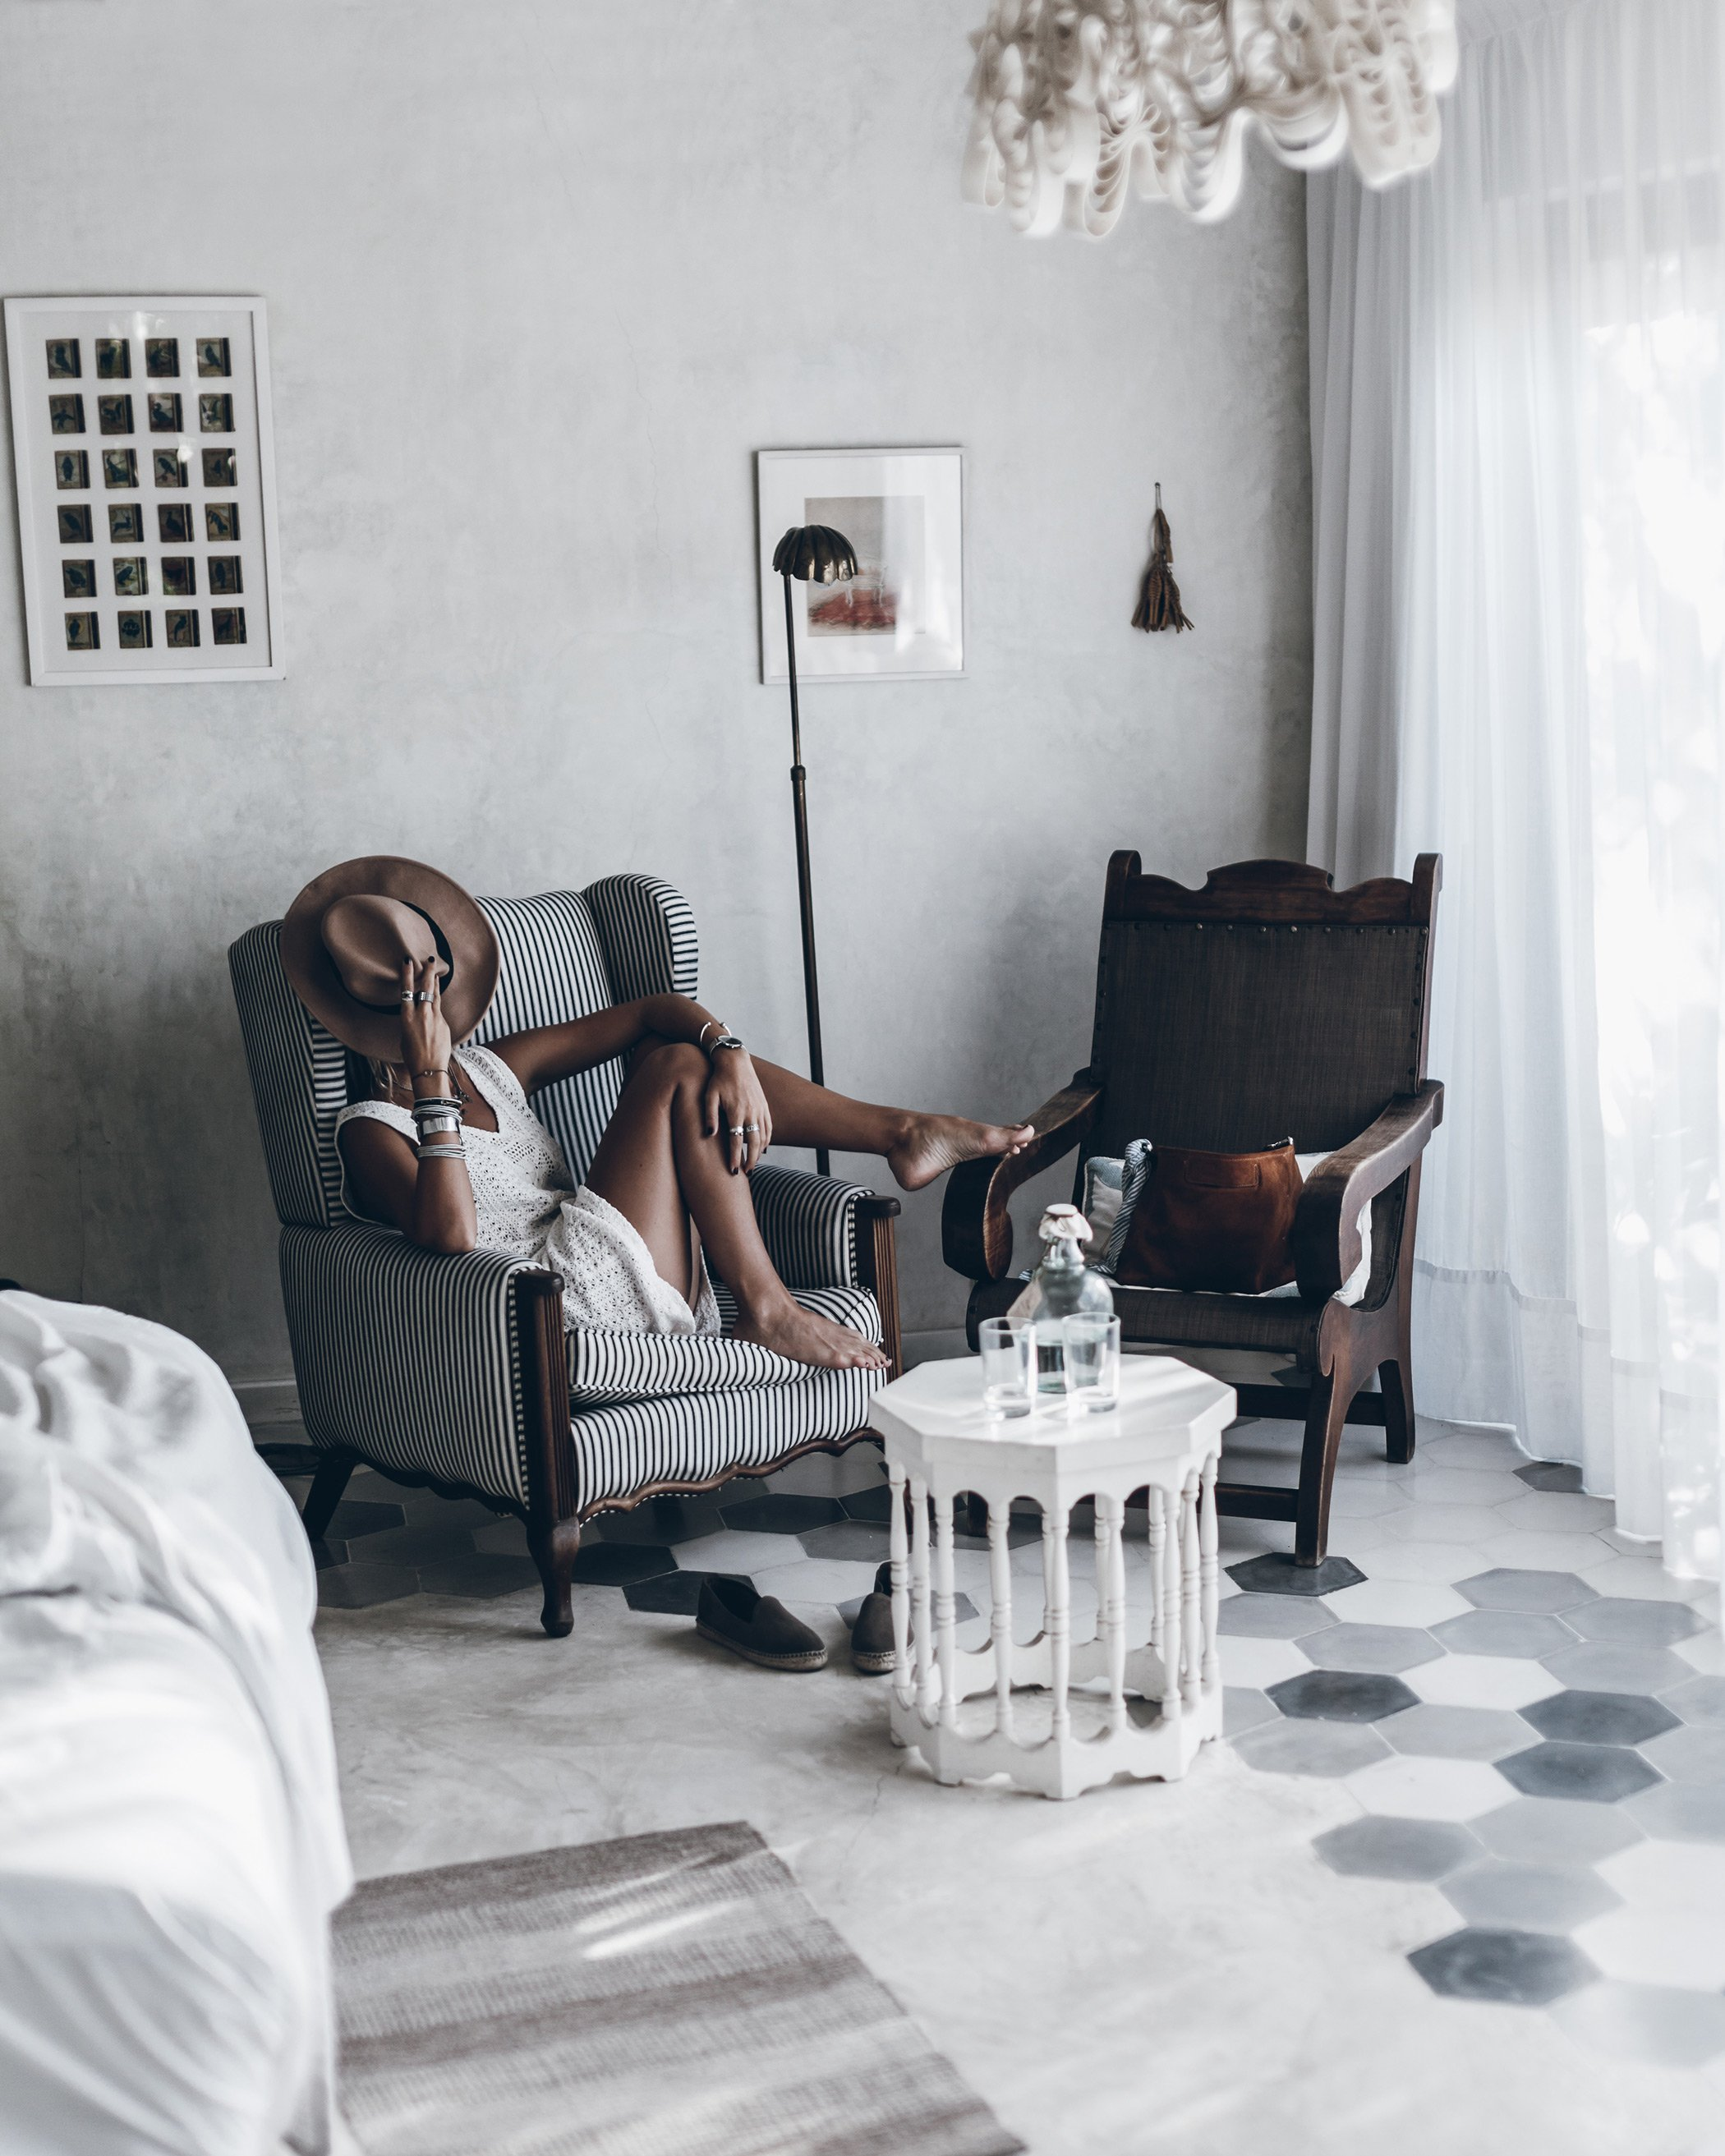 mikuta-la-semilla-hotel-playa-del-carmen-mexico-43